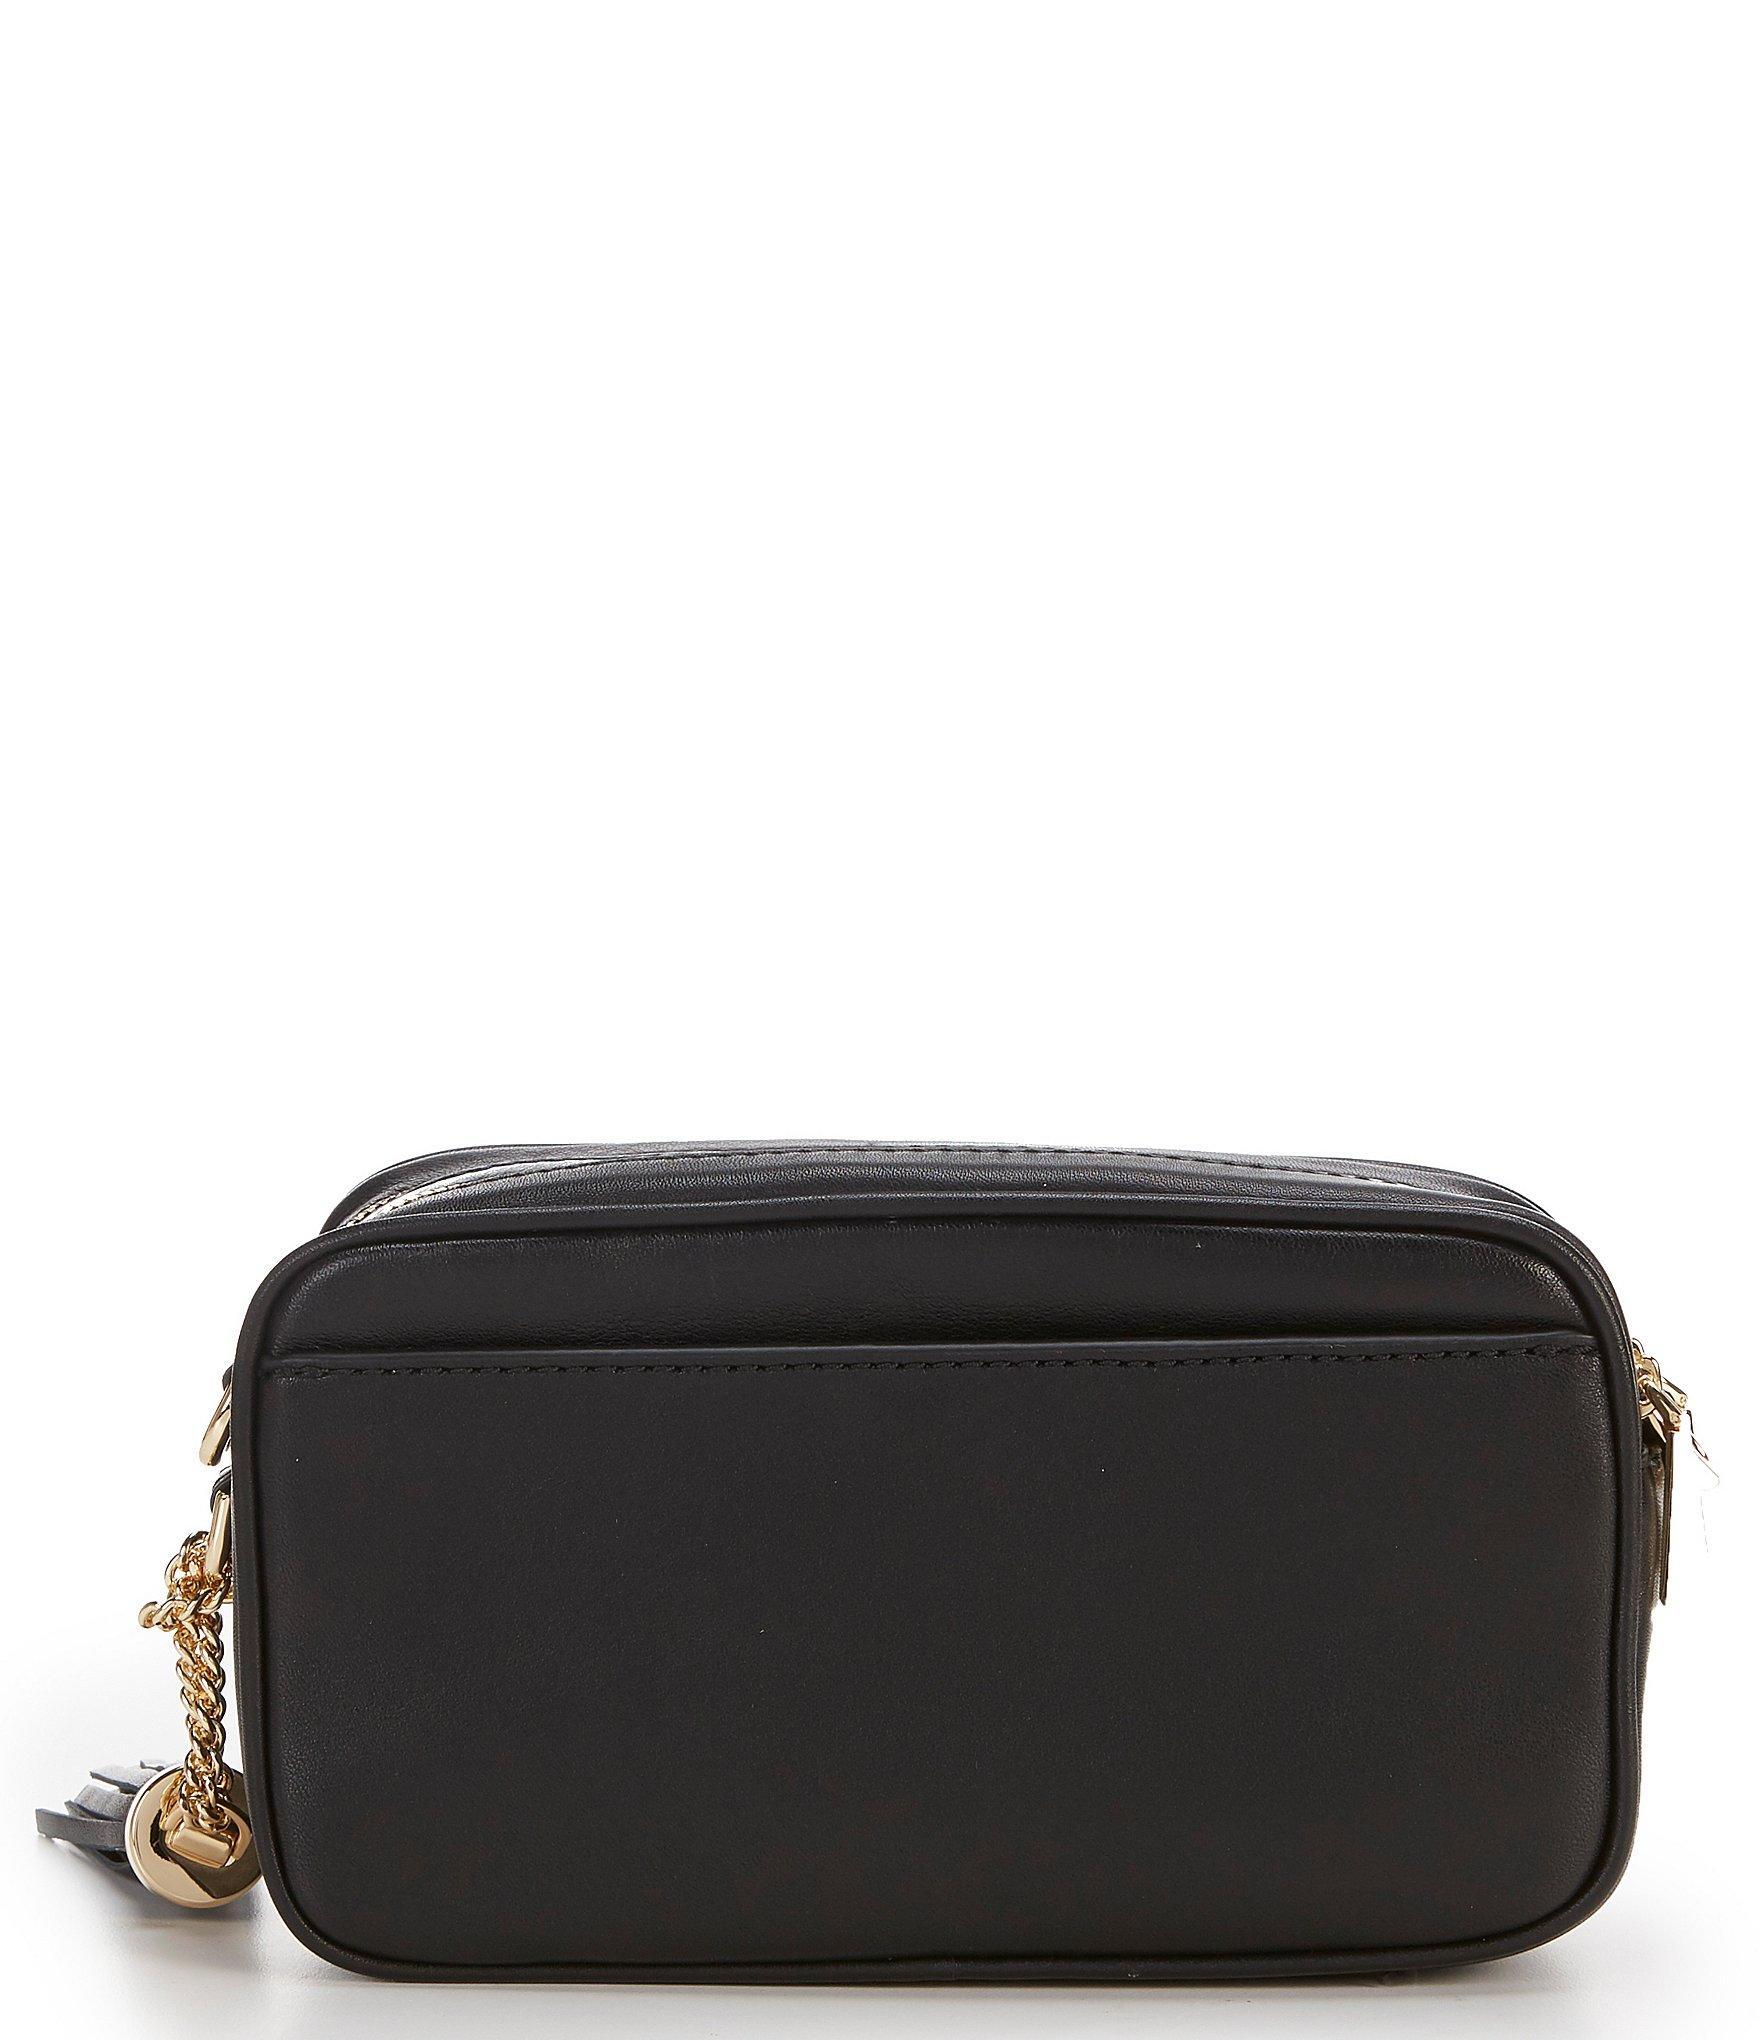 e9e9016fcdc4 MICHAEL Michael Kors - Black Small Quilted Camera Cross-body Bag - Lyst.  View fullscreen